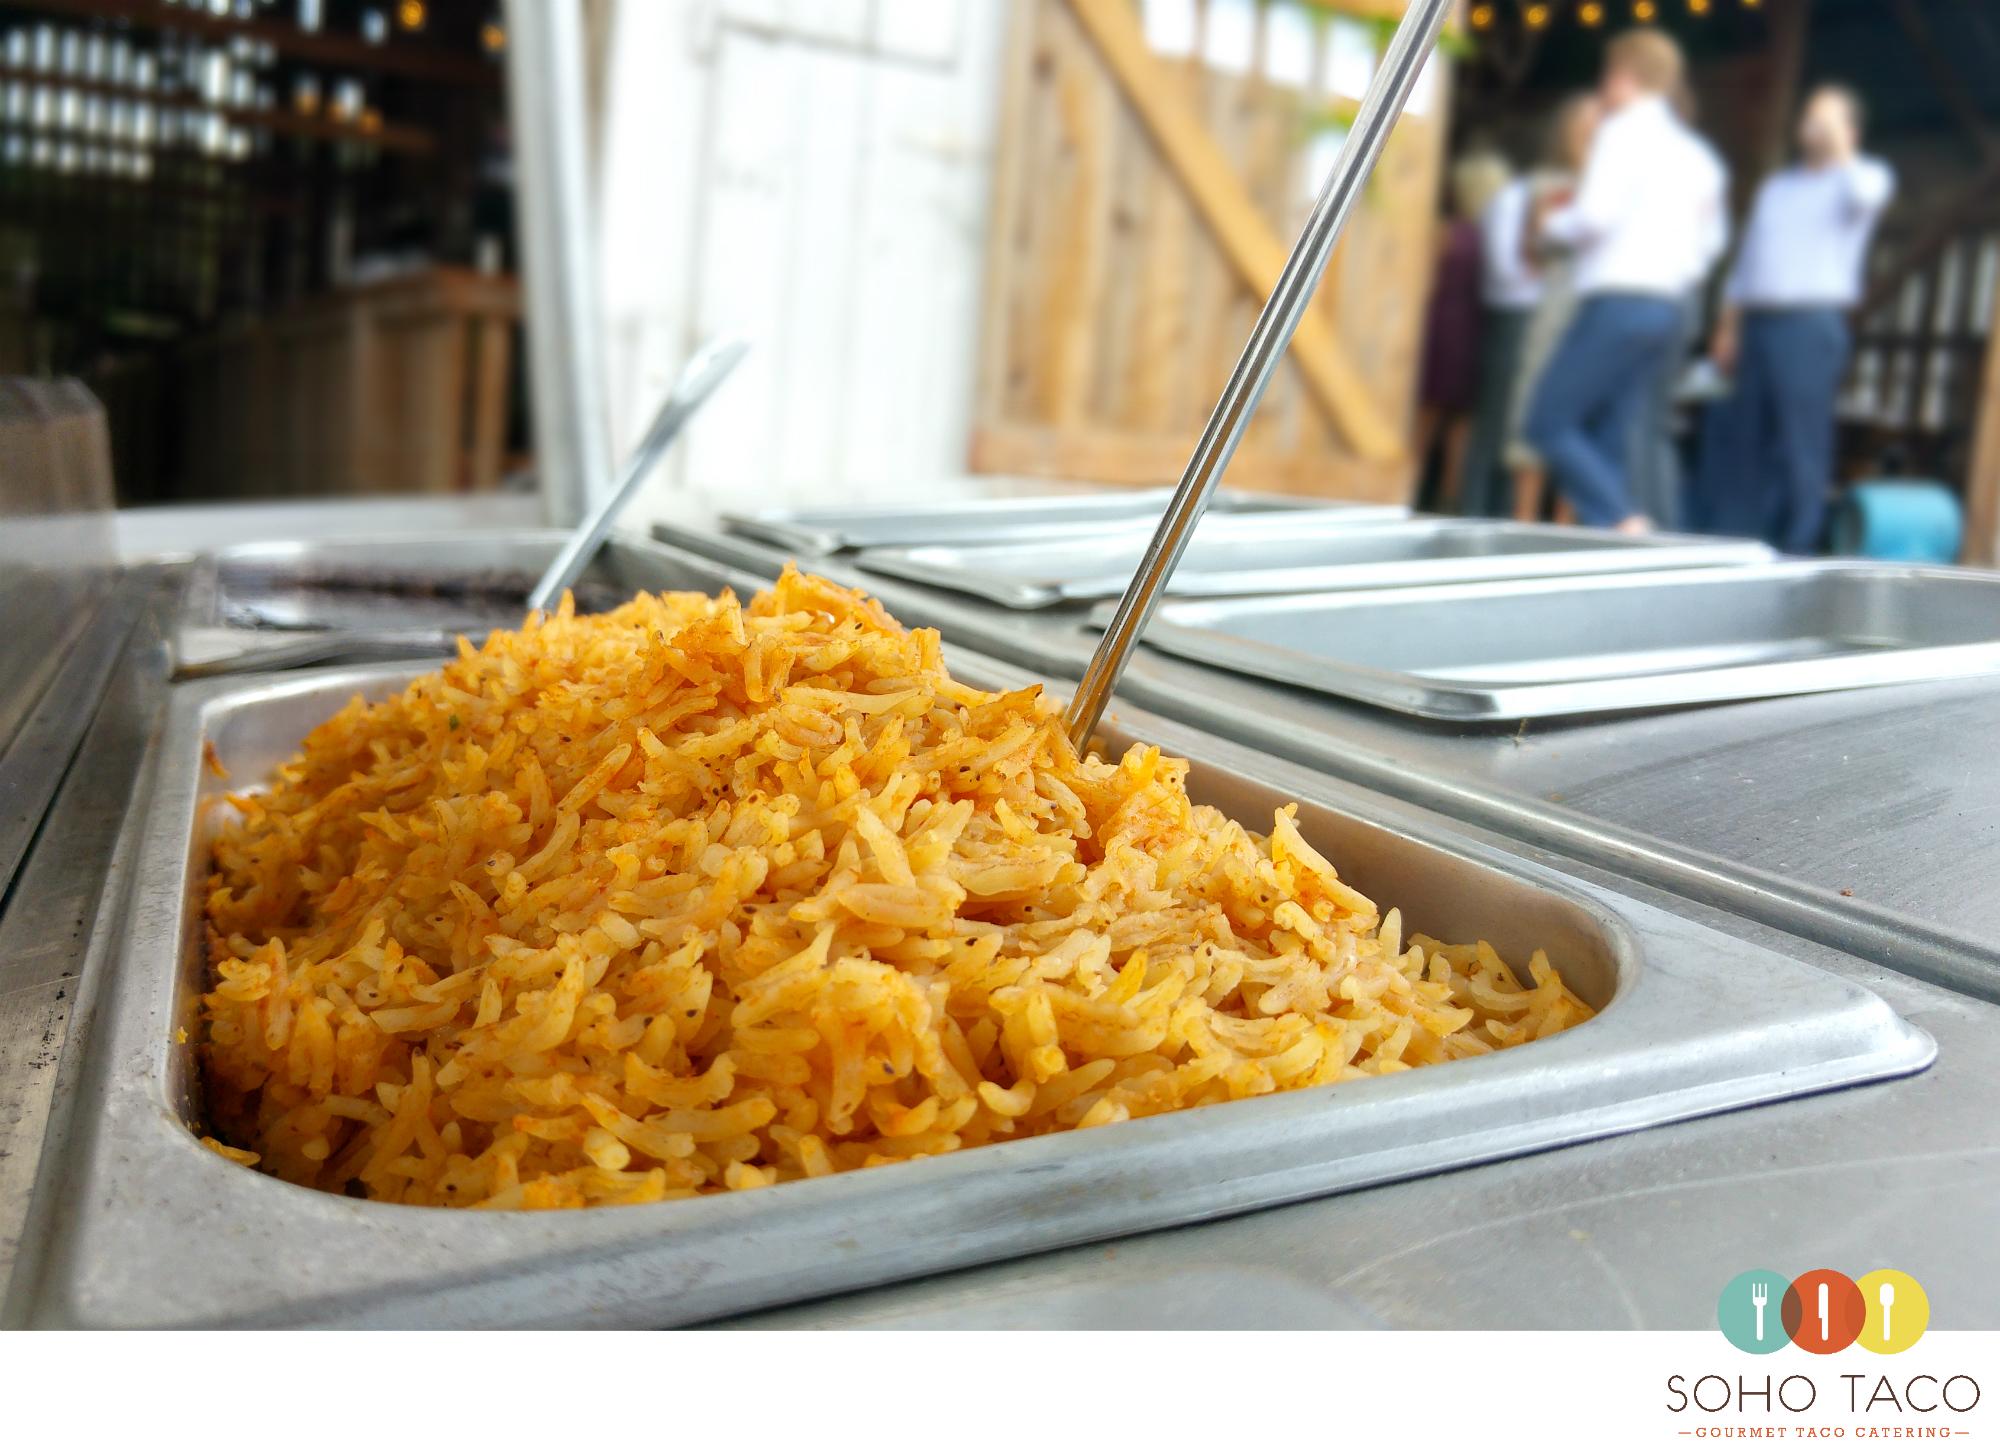 SOHO TACO Gourmet Taco Catering - San Luis Obispo - Spreafico Farms Barn - Spanish Rice